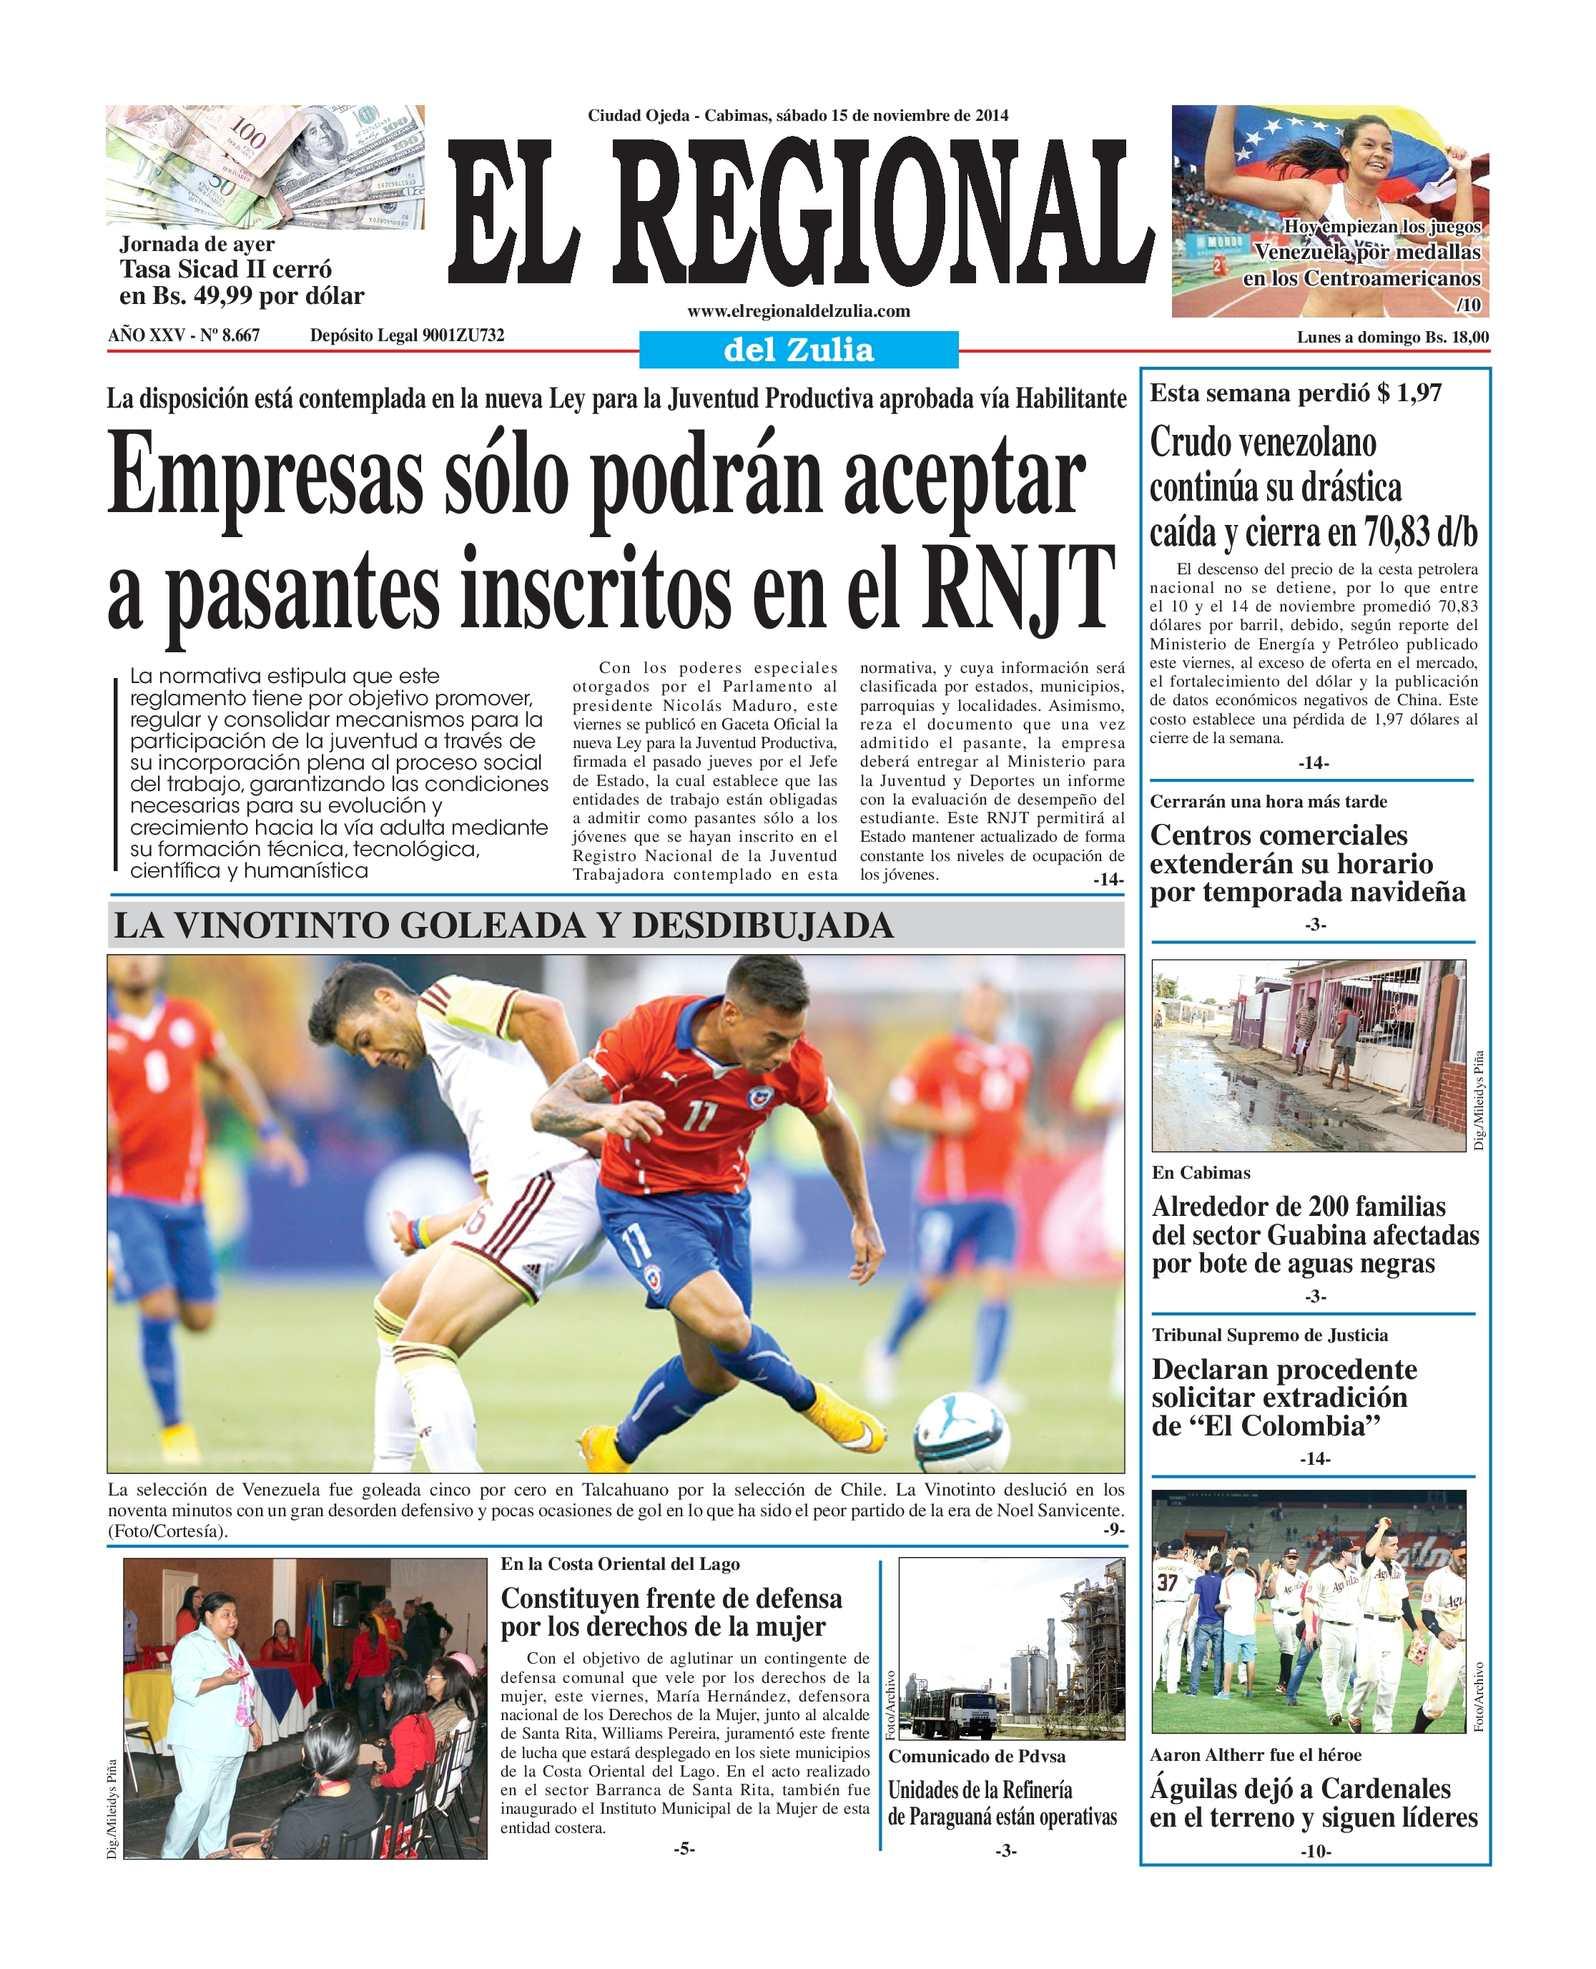 Calaméo - El Regional del Zulia 15-11-2014